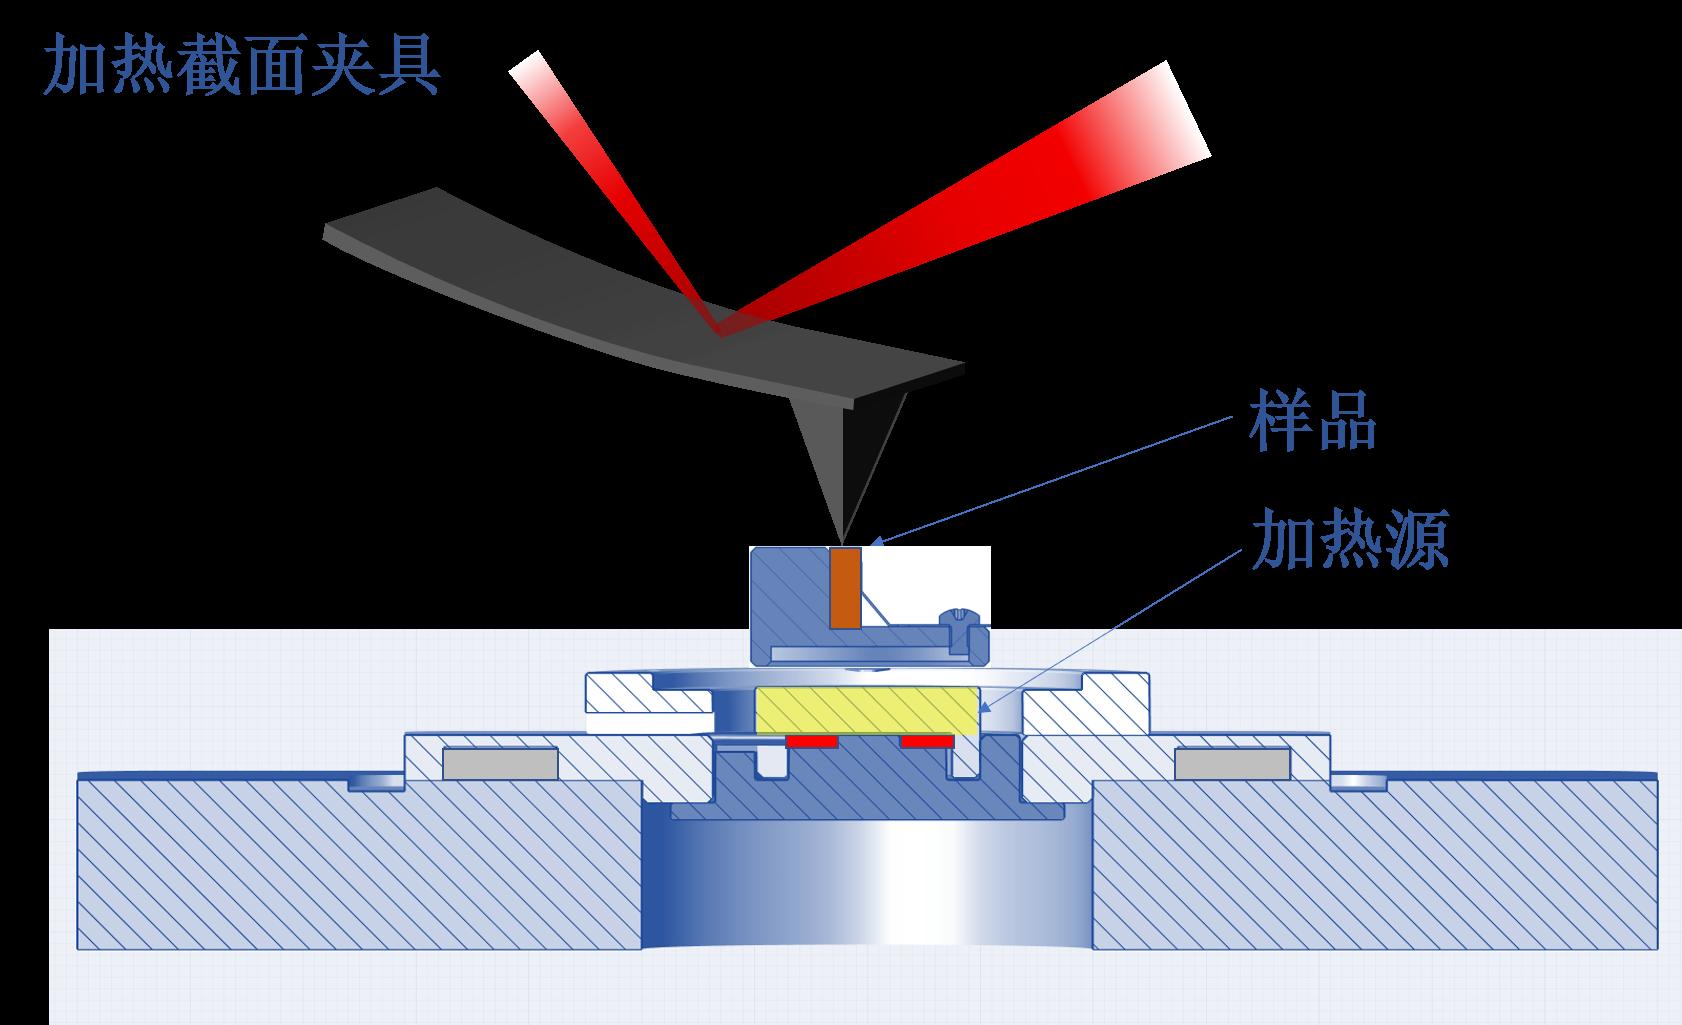 AFM加热截面夹具示意图